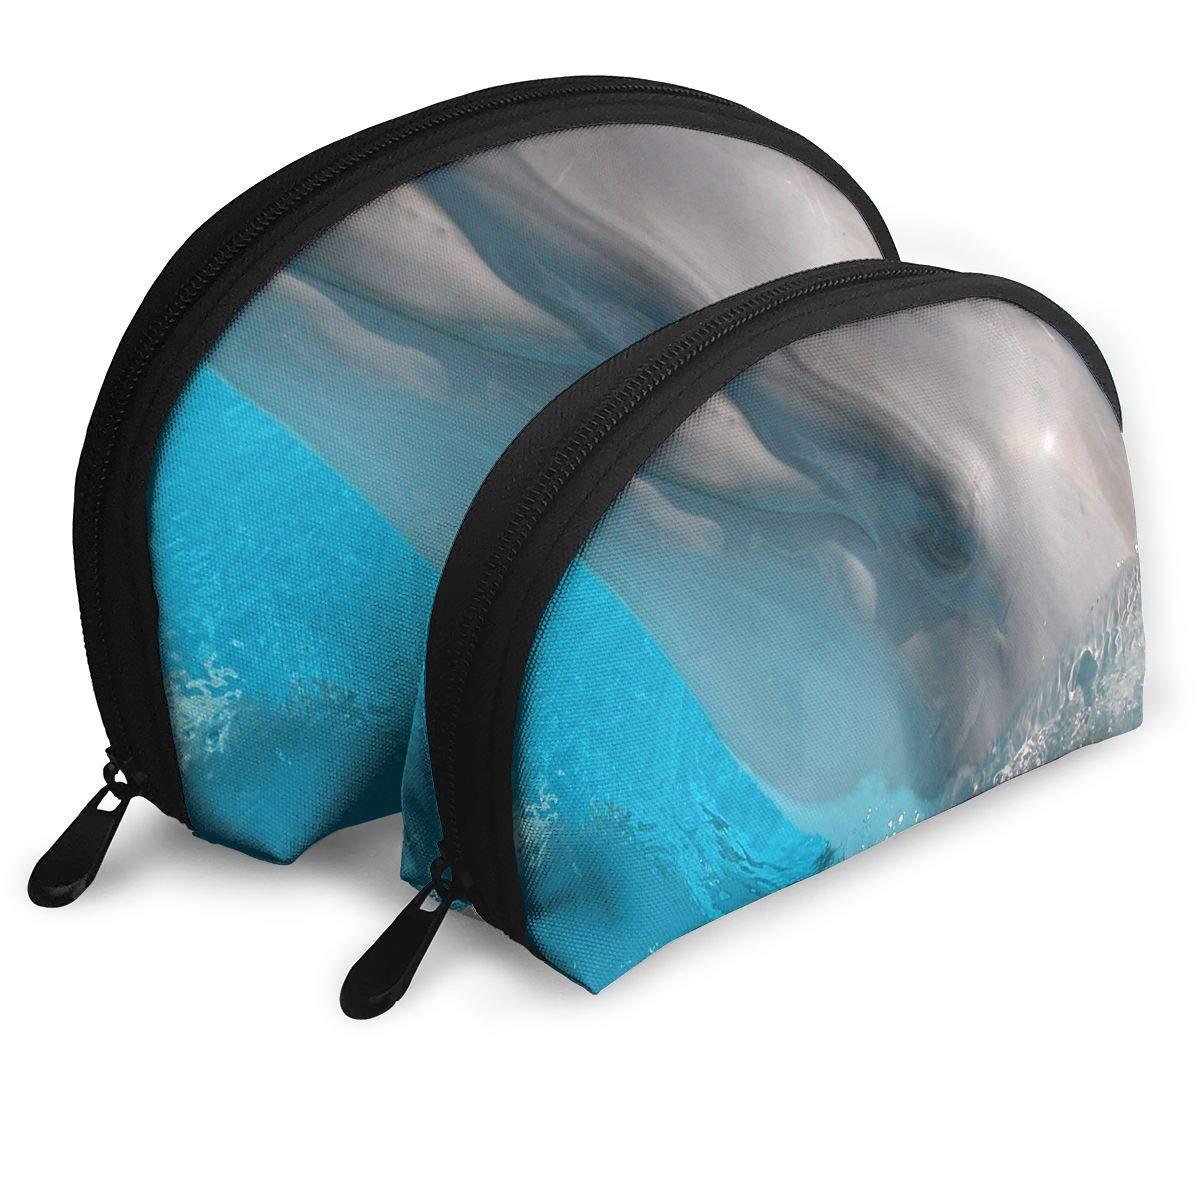 b398caf85acd Amazon.com : Makeup Bag Cute Animals Handy Half Moon Travel Bags Set ...